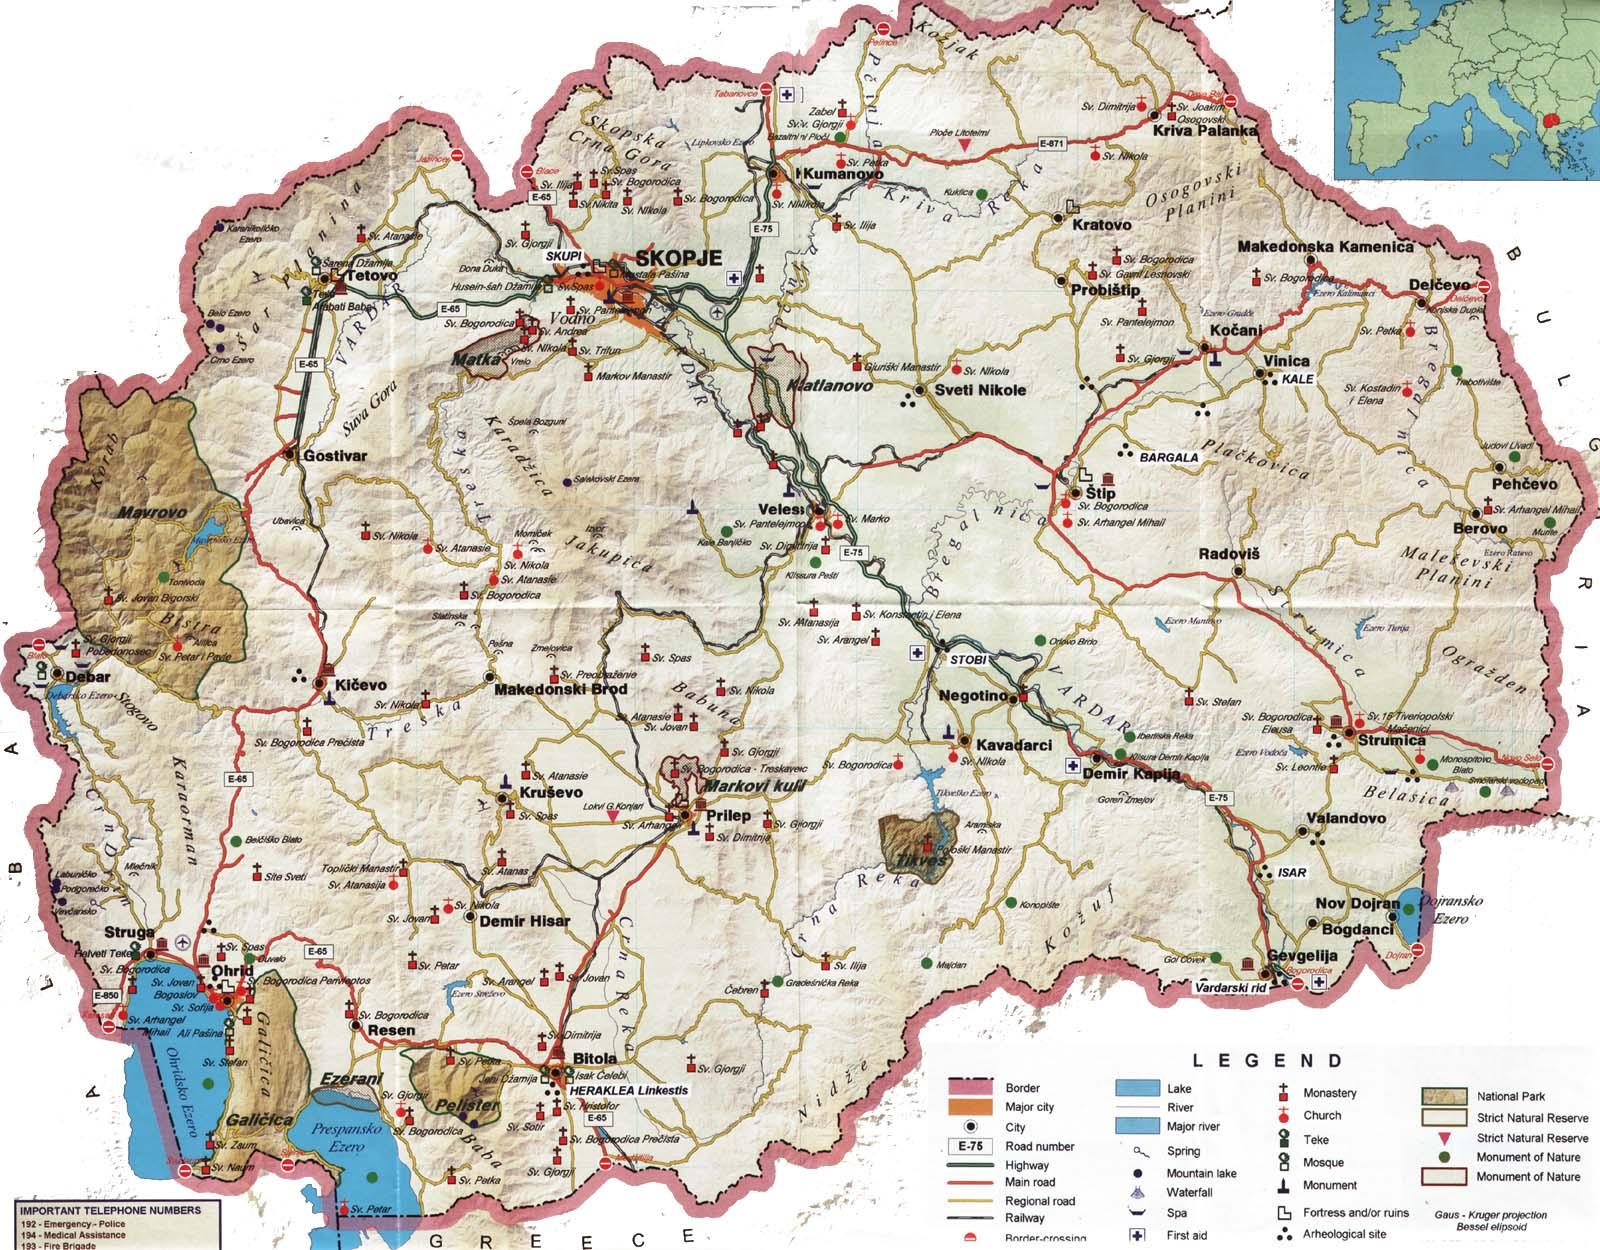 térkép maps Macedonia online maps   geographical, political, road, railway  térkép maps